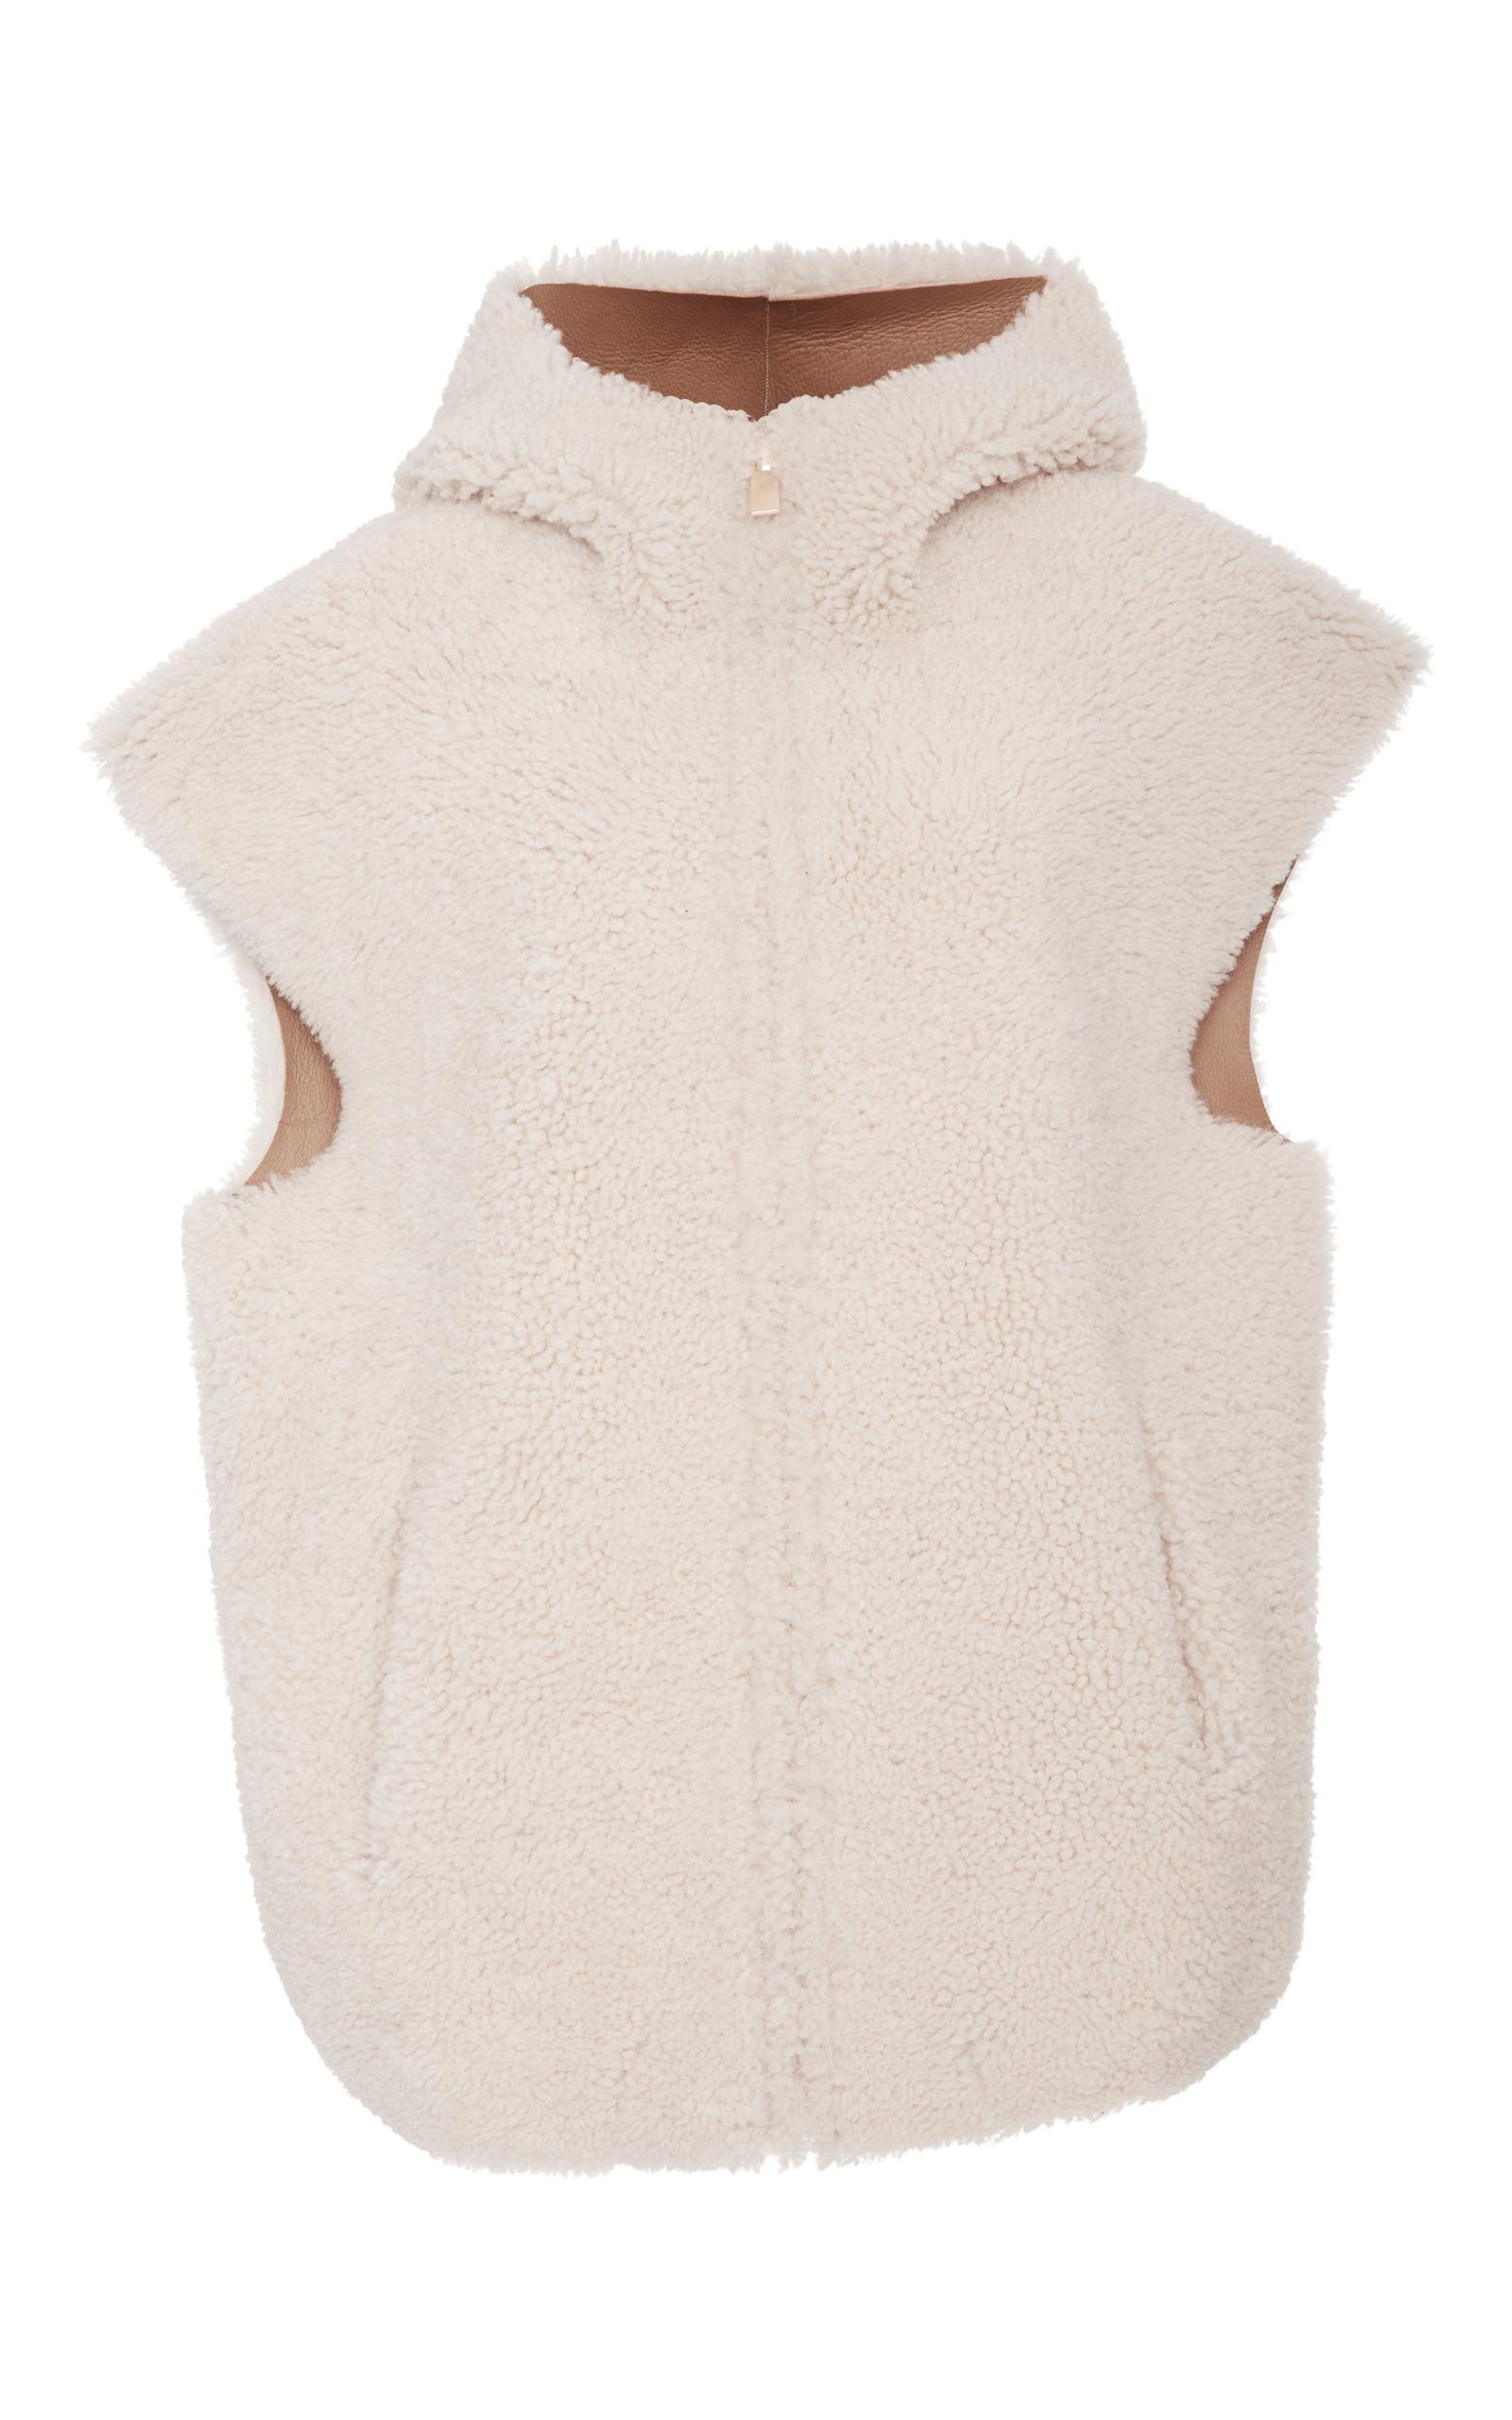 149c12e410d Michael Kors CollectionLamb Shearling Hooded Vest. CLOSE. Loading